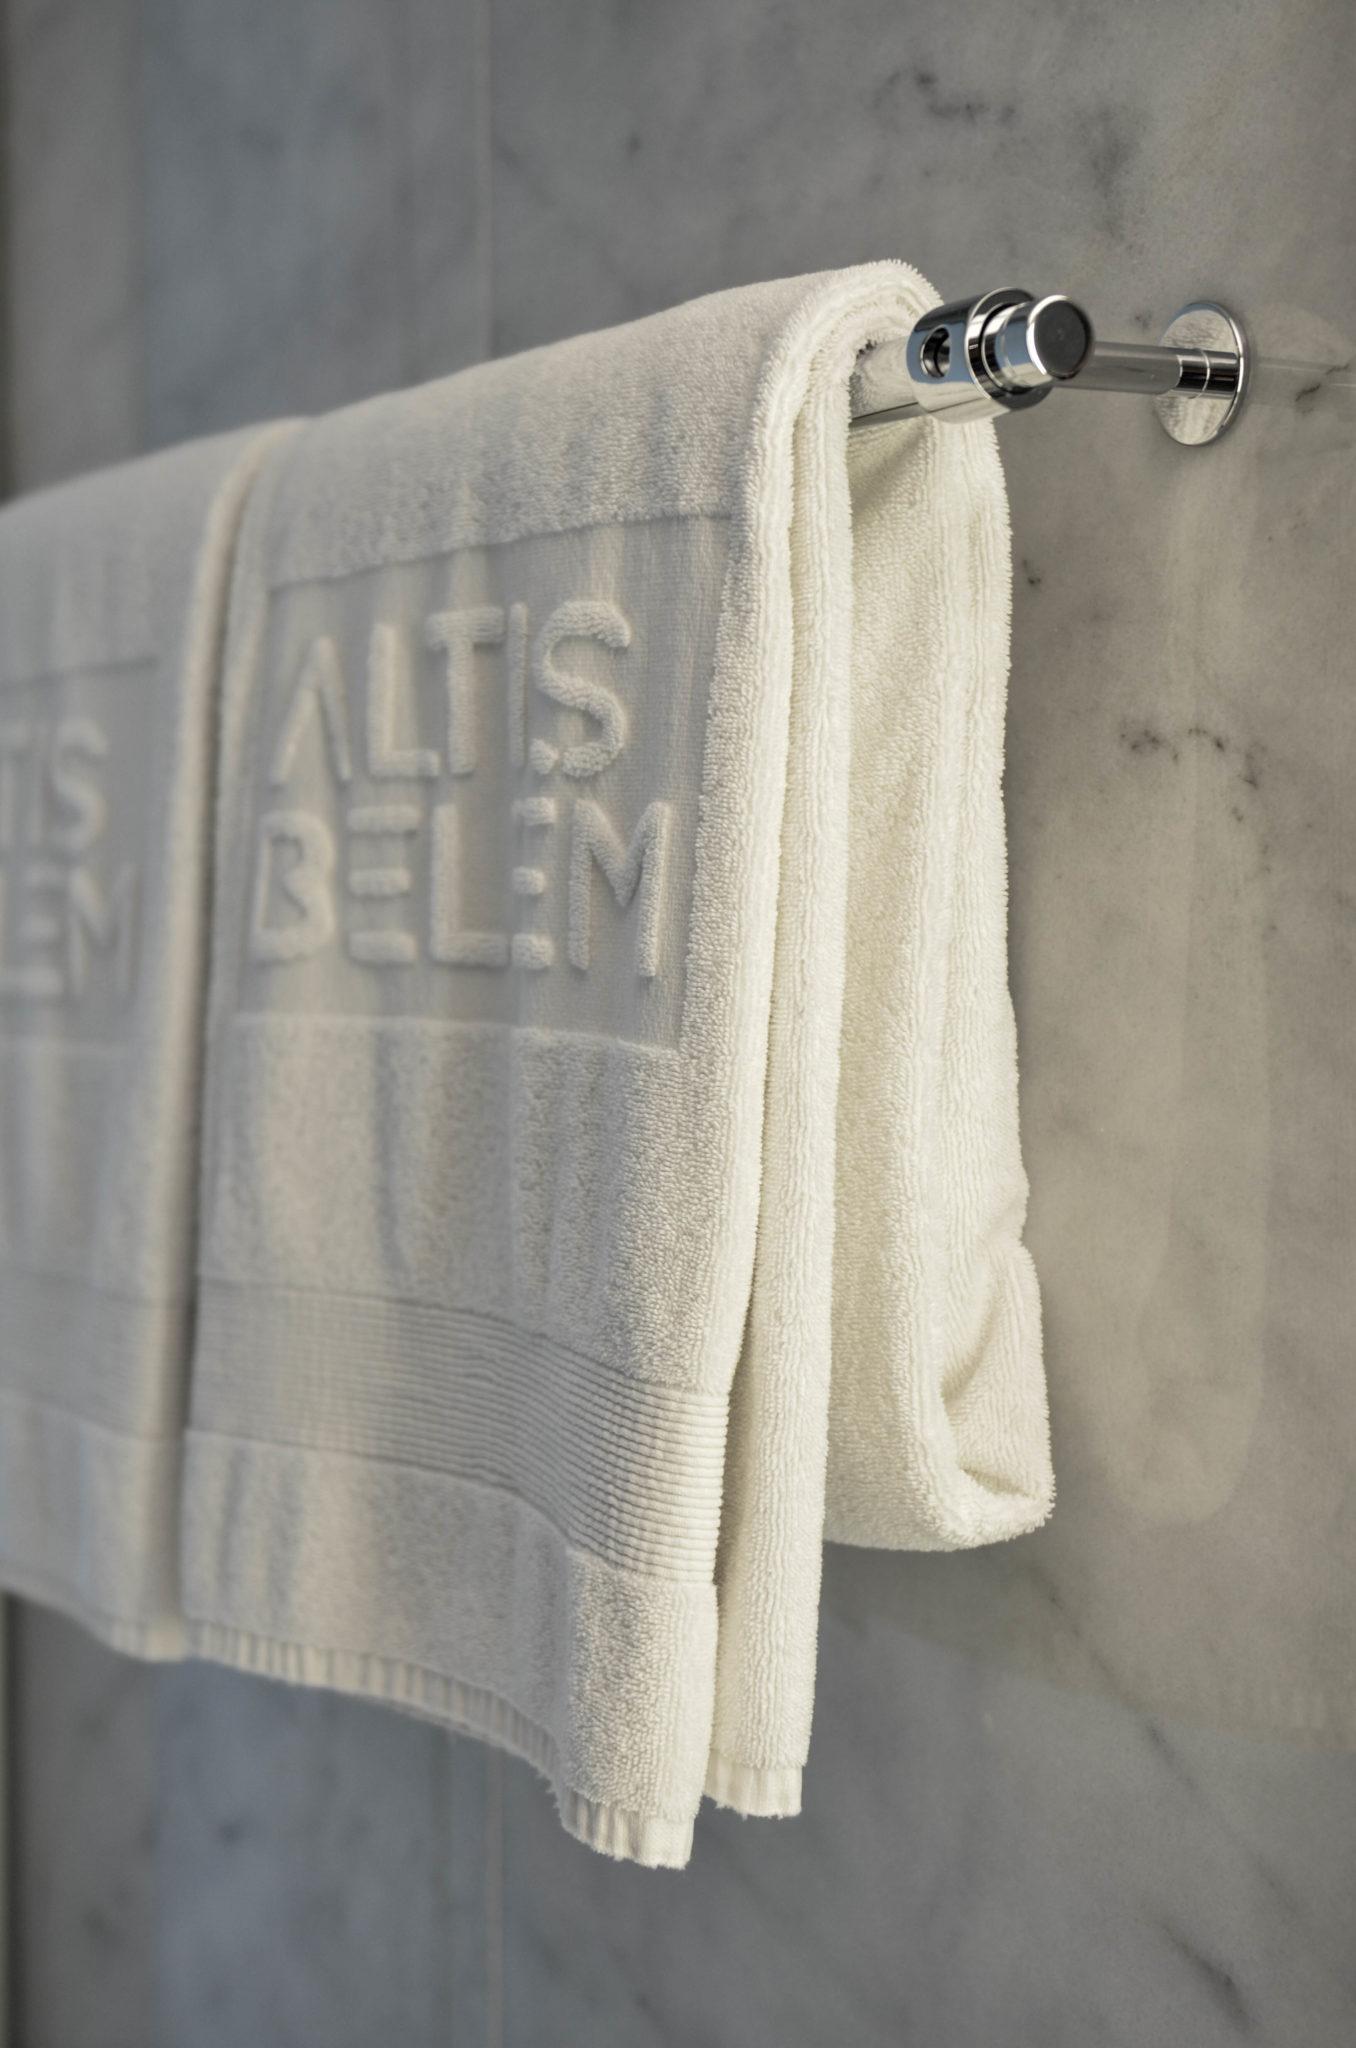 Altis-Belem-Hotel-Lissabon-Review-Handtuch-Badezimmer